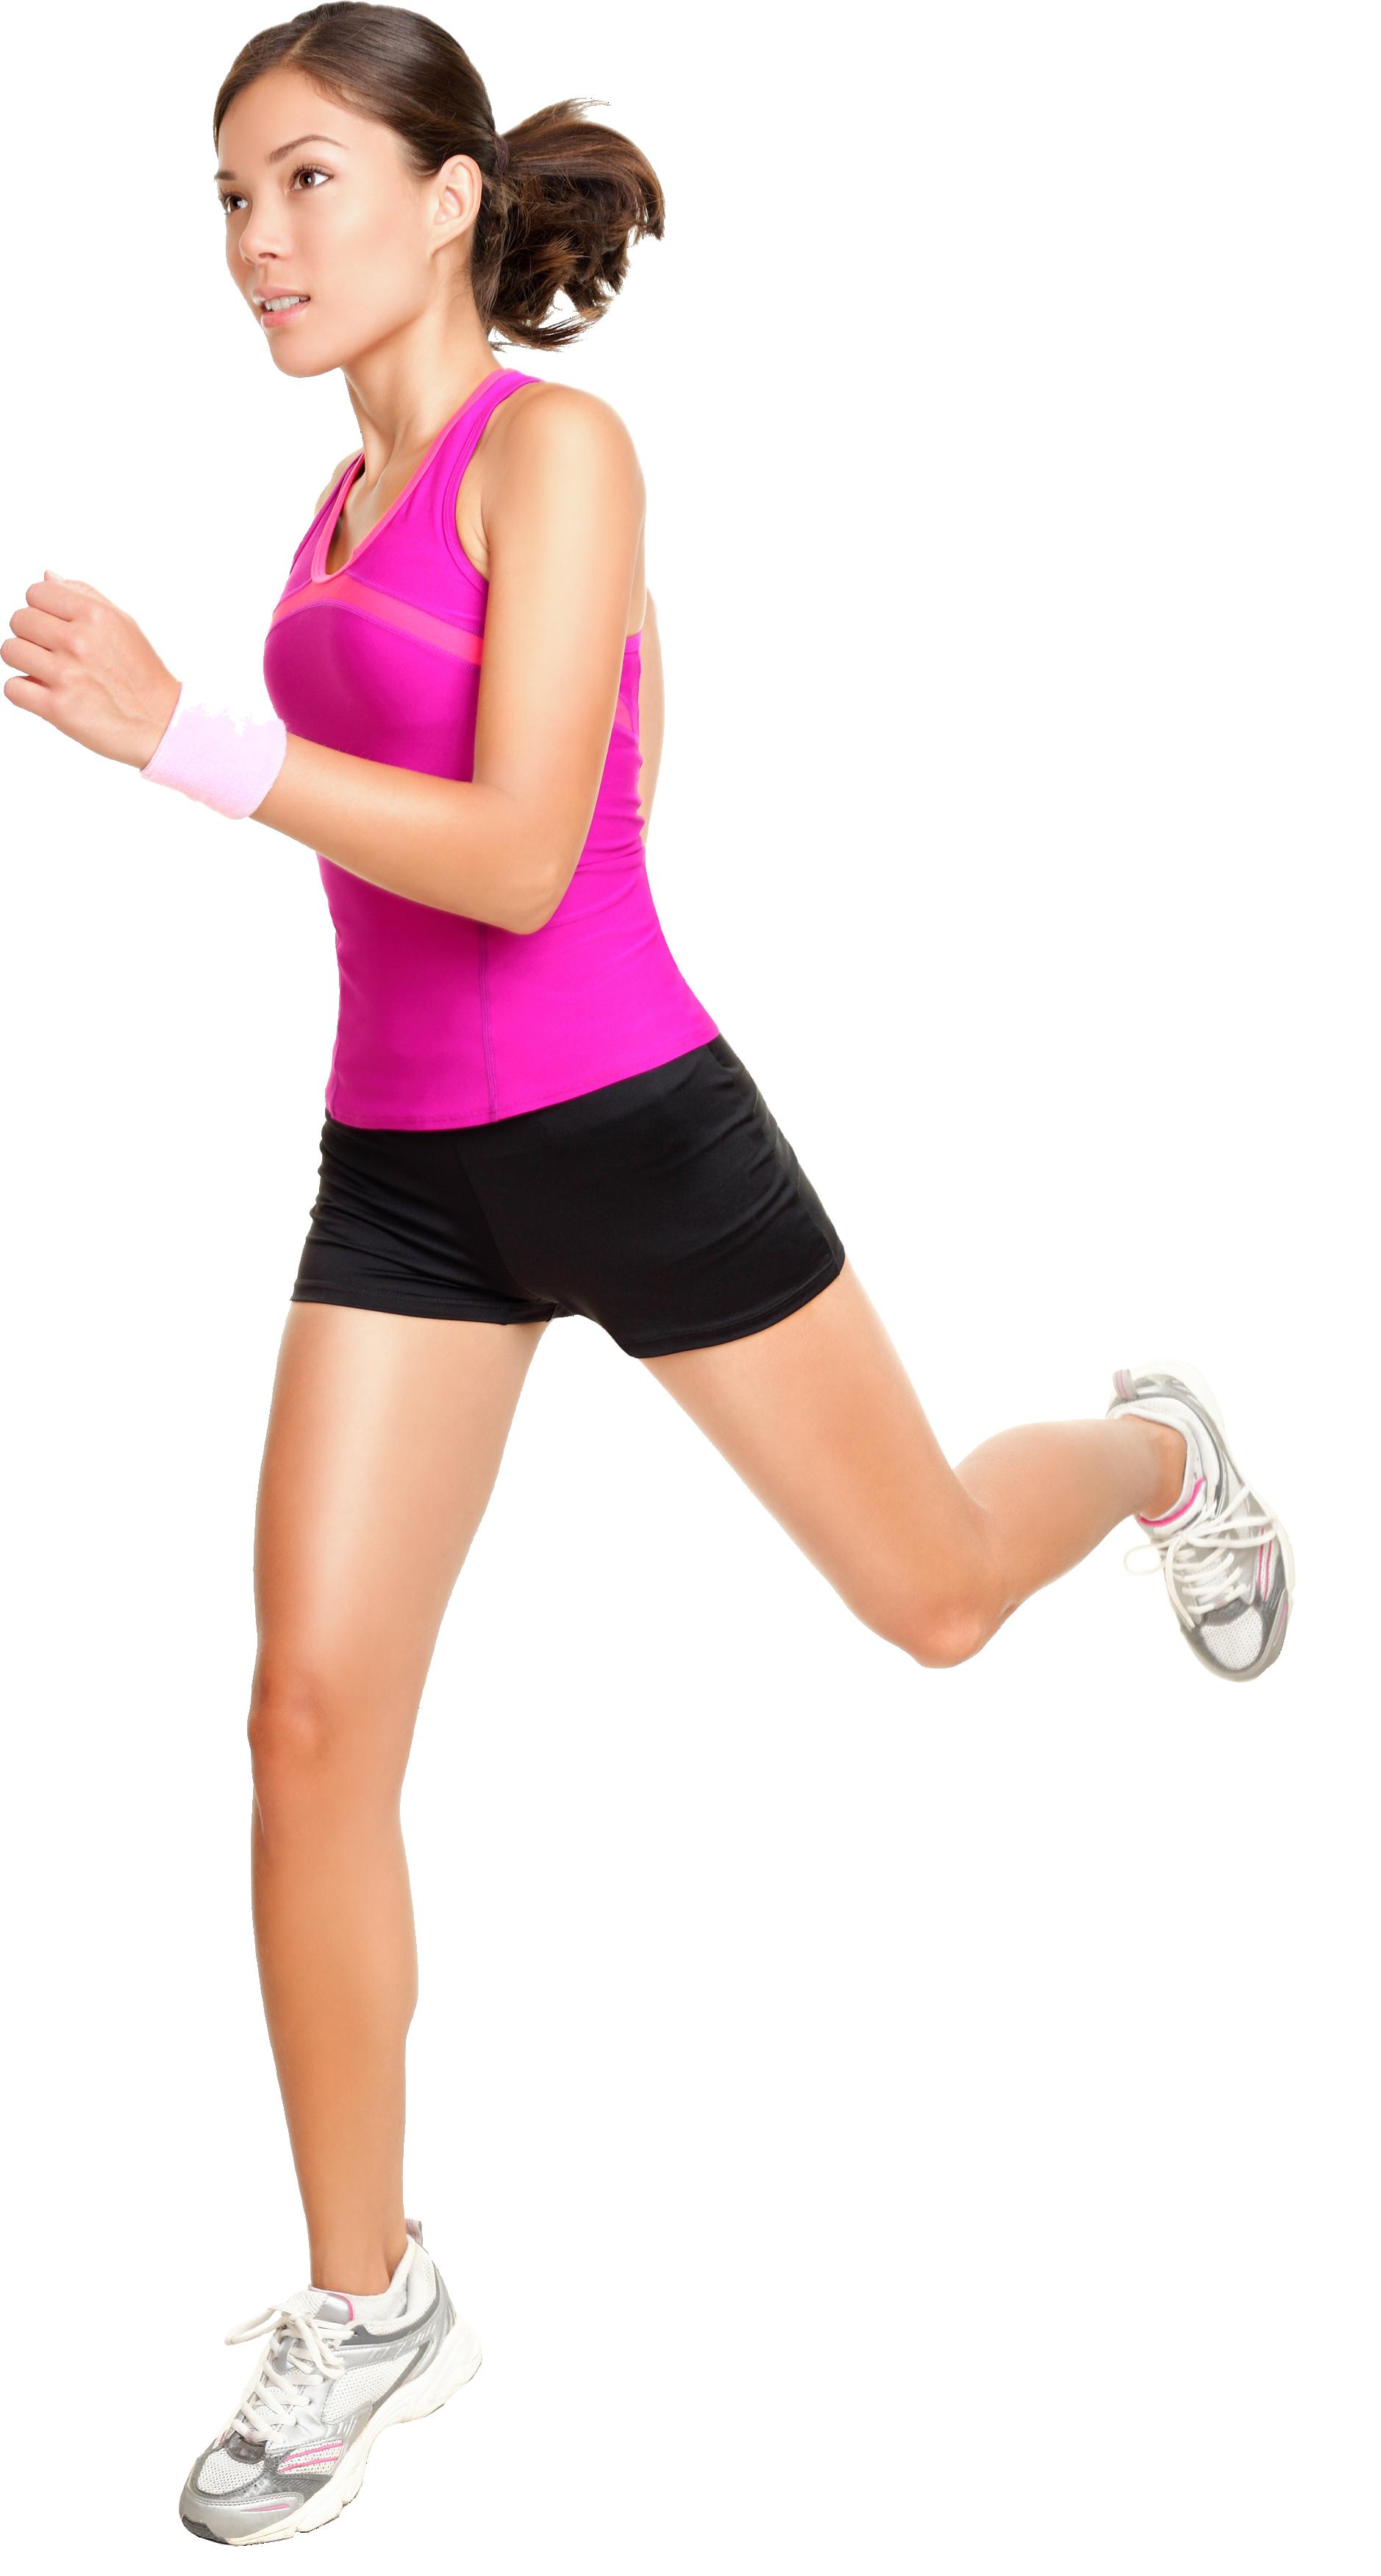 Woman Jogging PNG - 51231